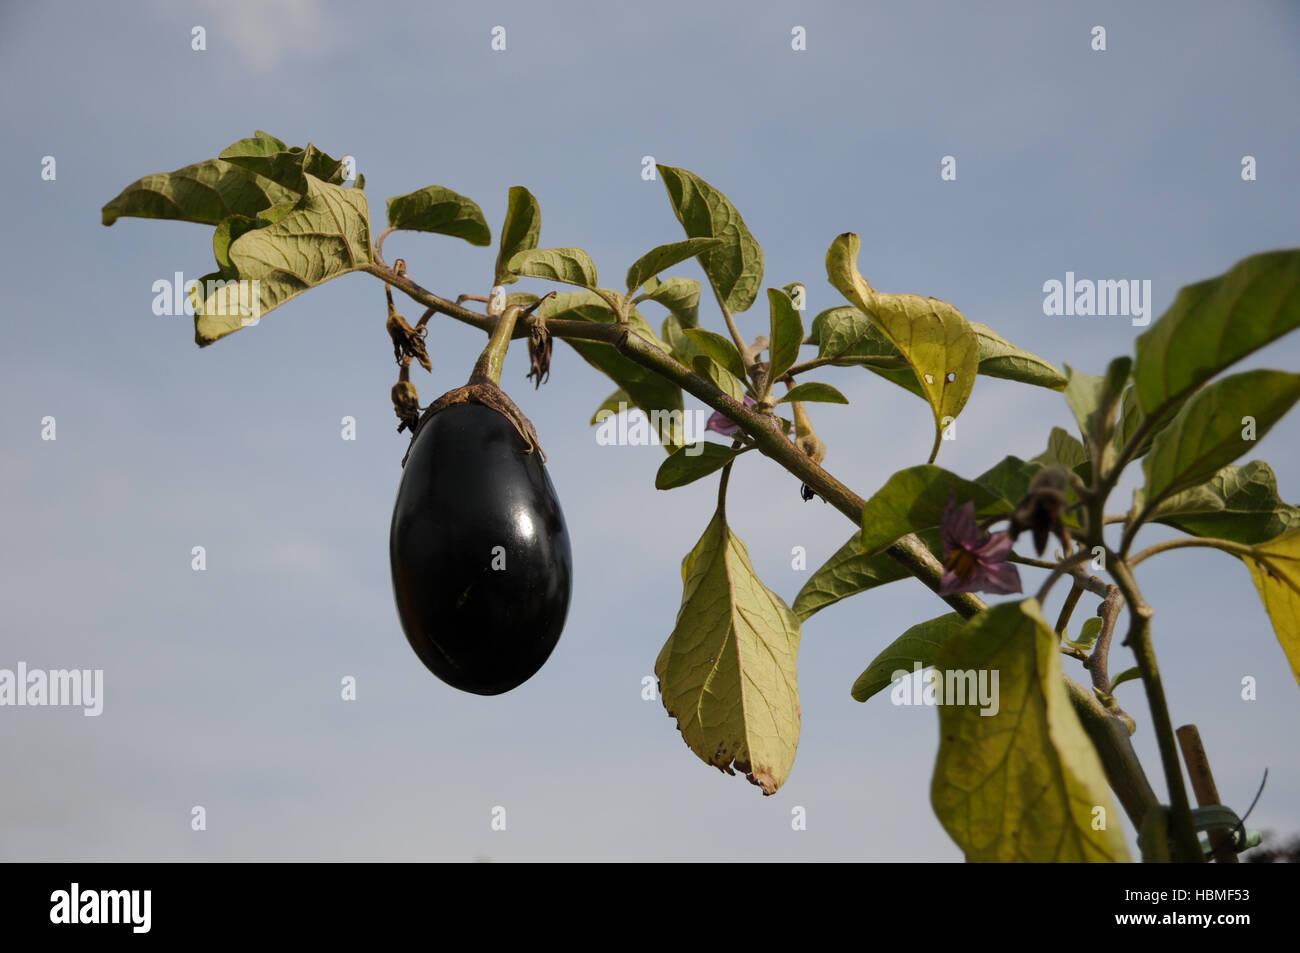 Solanum melongena, Aubergine, Eggplant Stock Photo